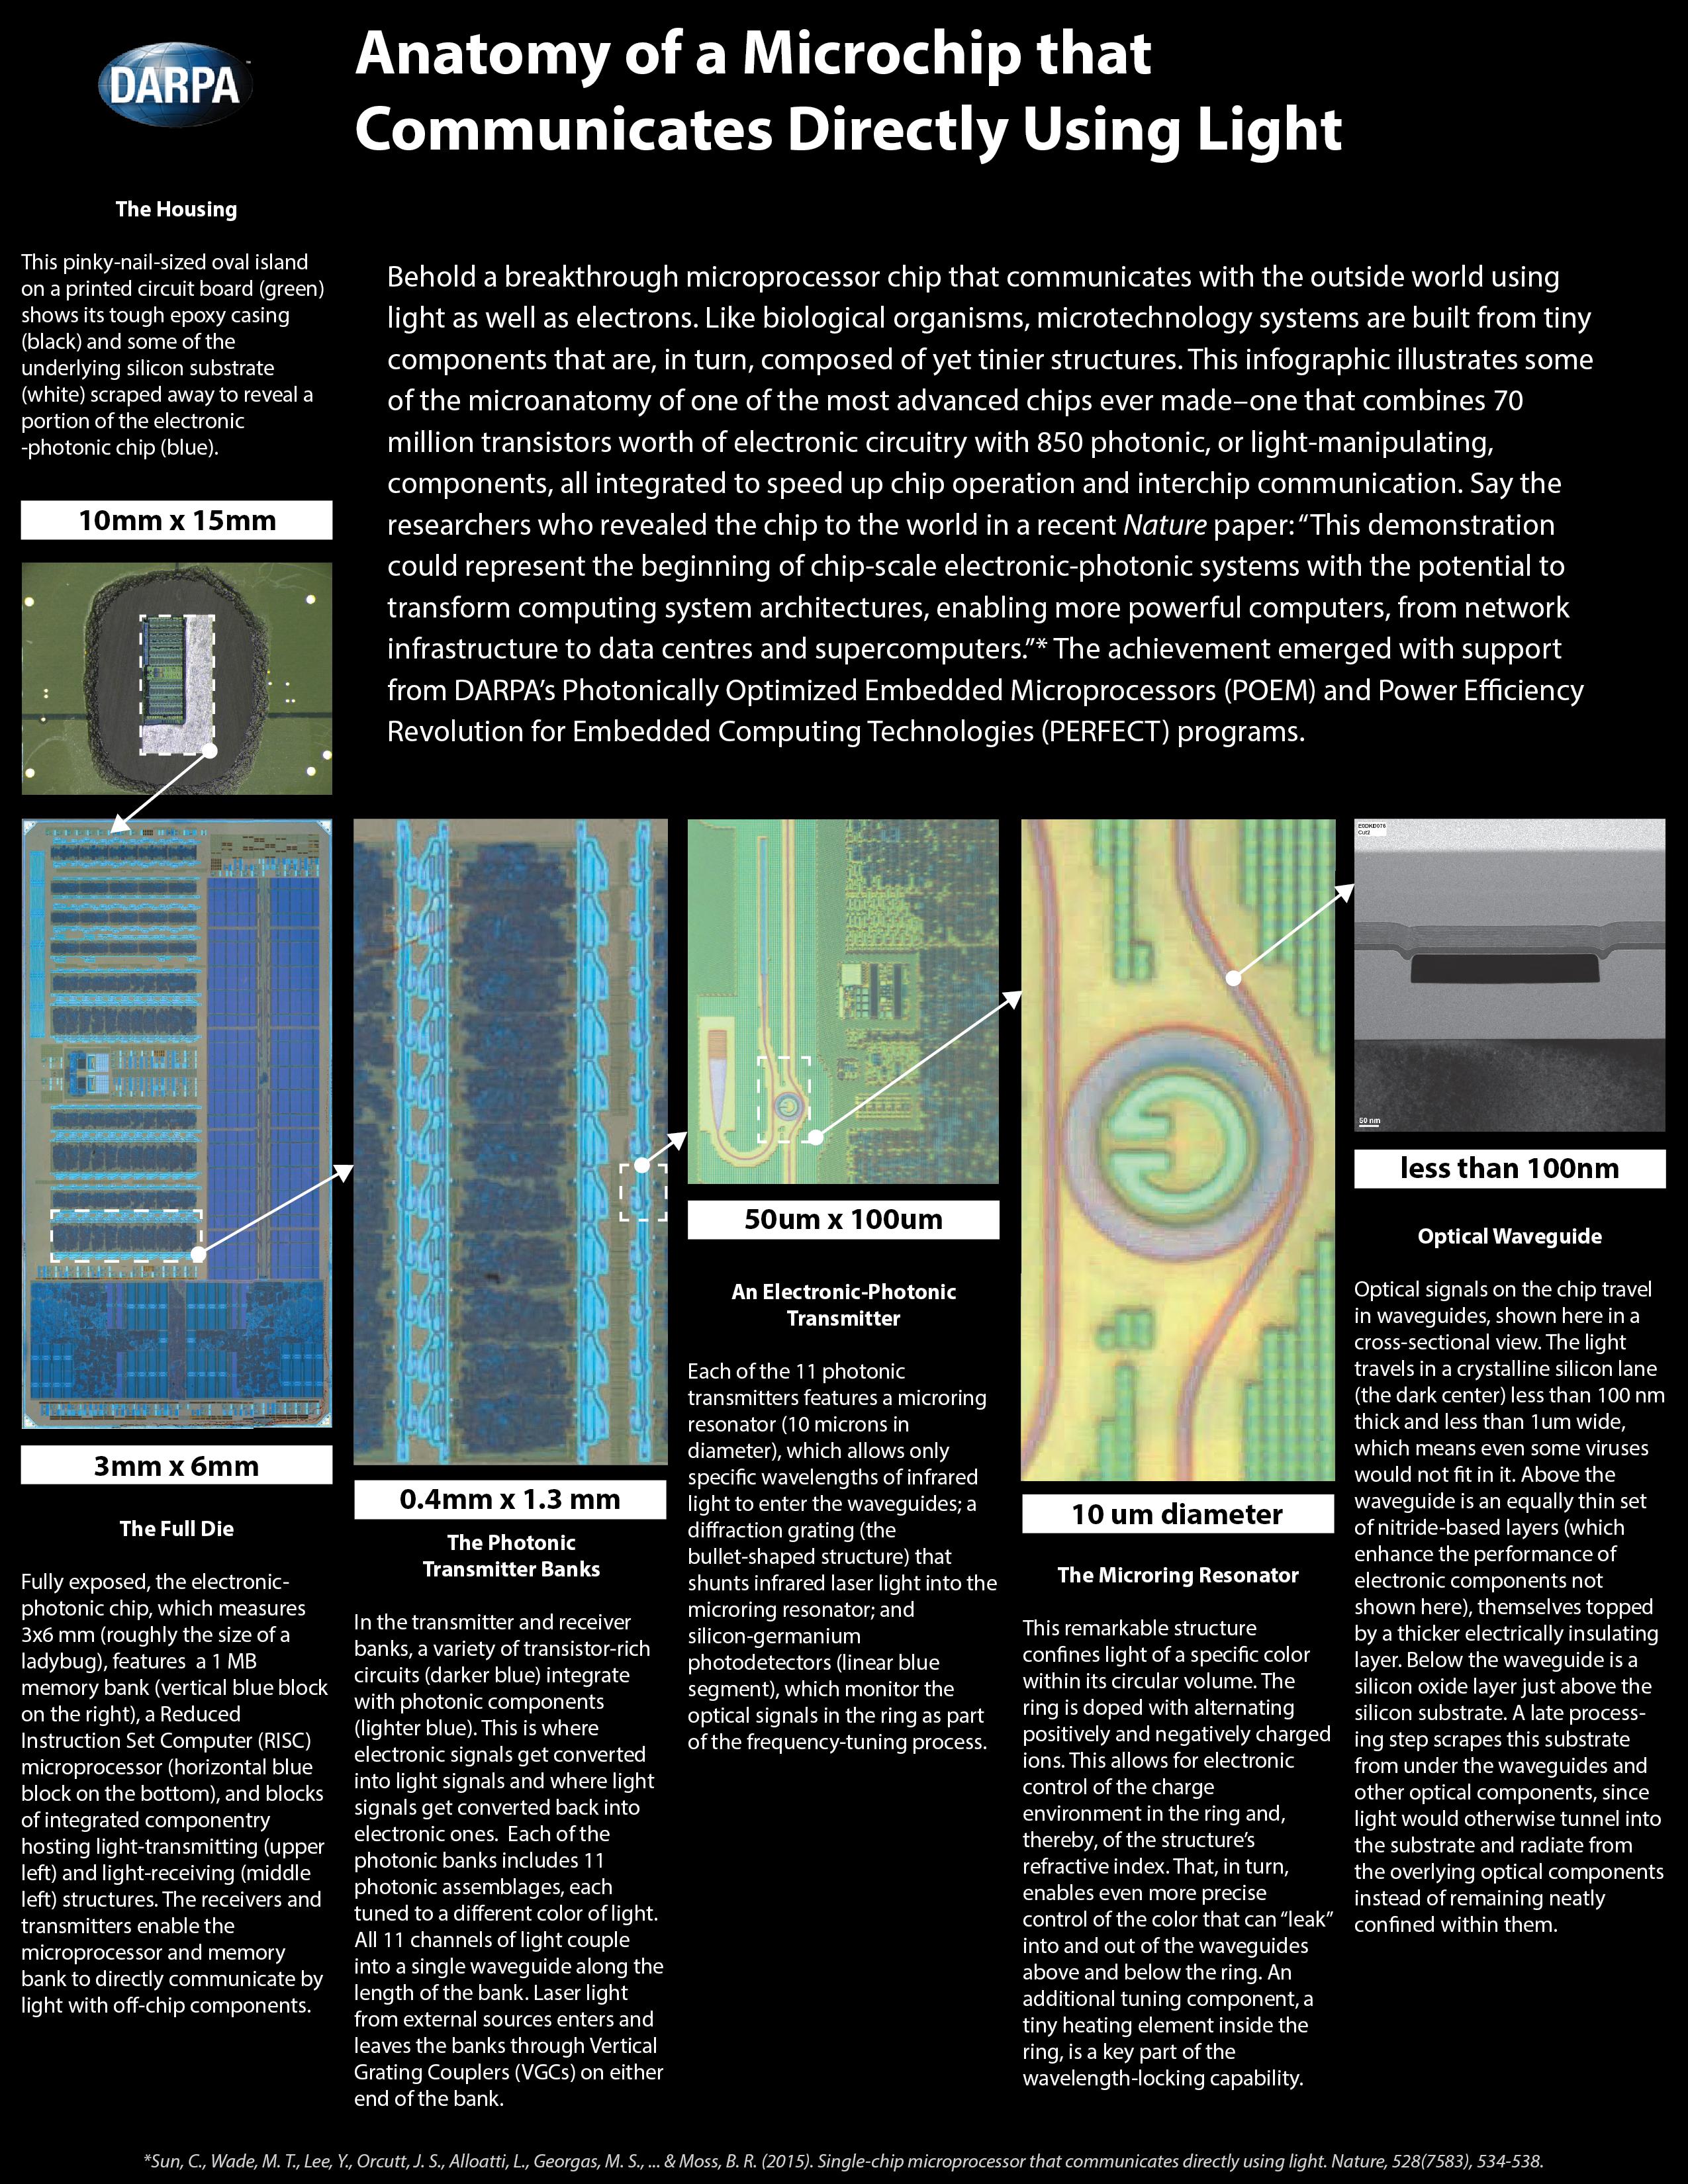 Combining Electronics And Photonics Opens Way For Next Generation Integrated Circuit Novel Electronic Photonic Debuts